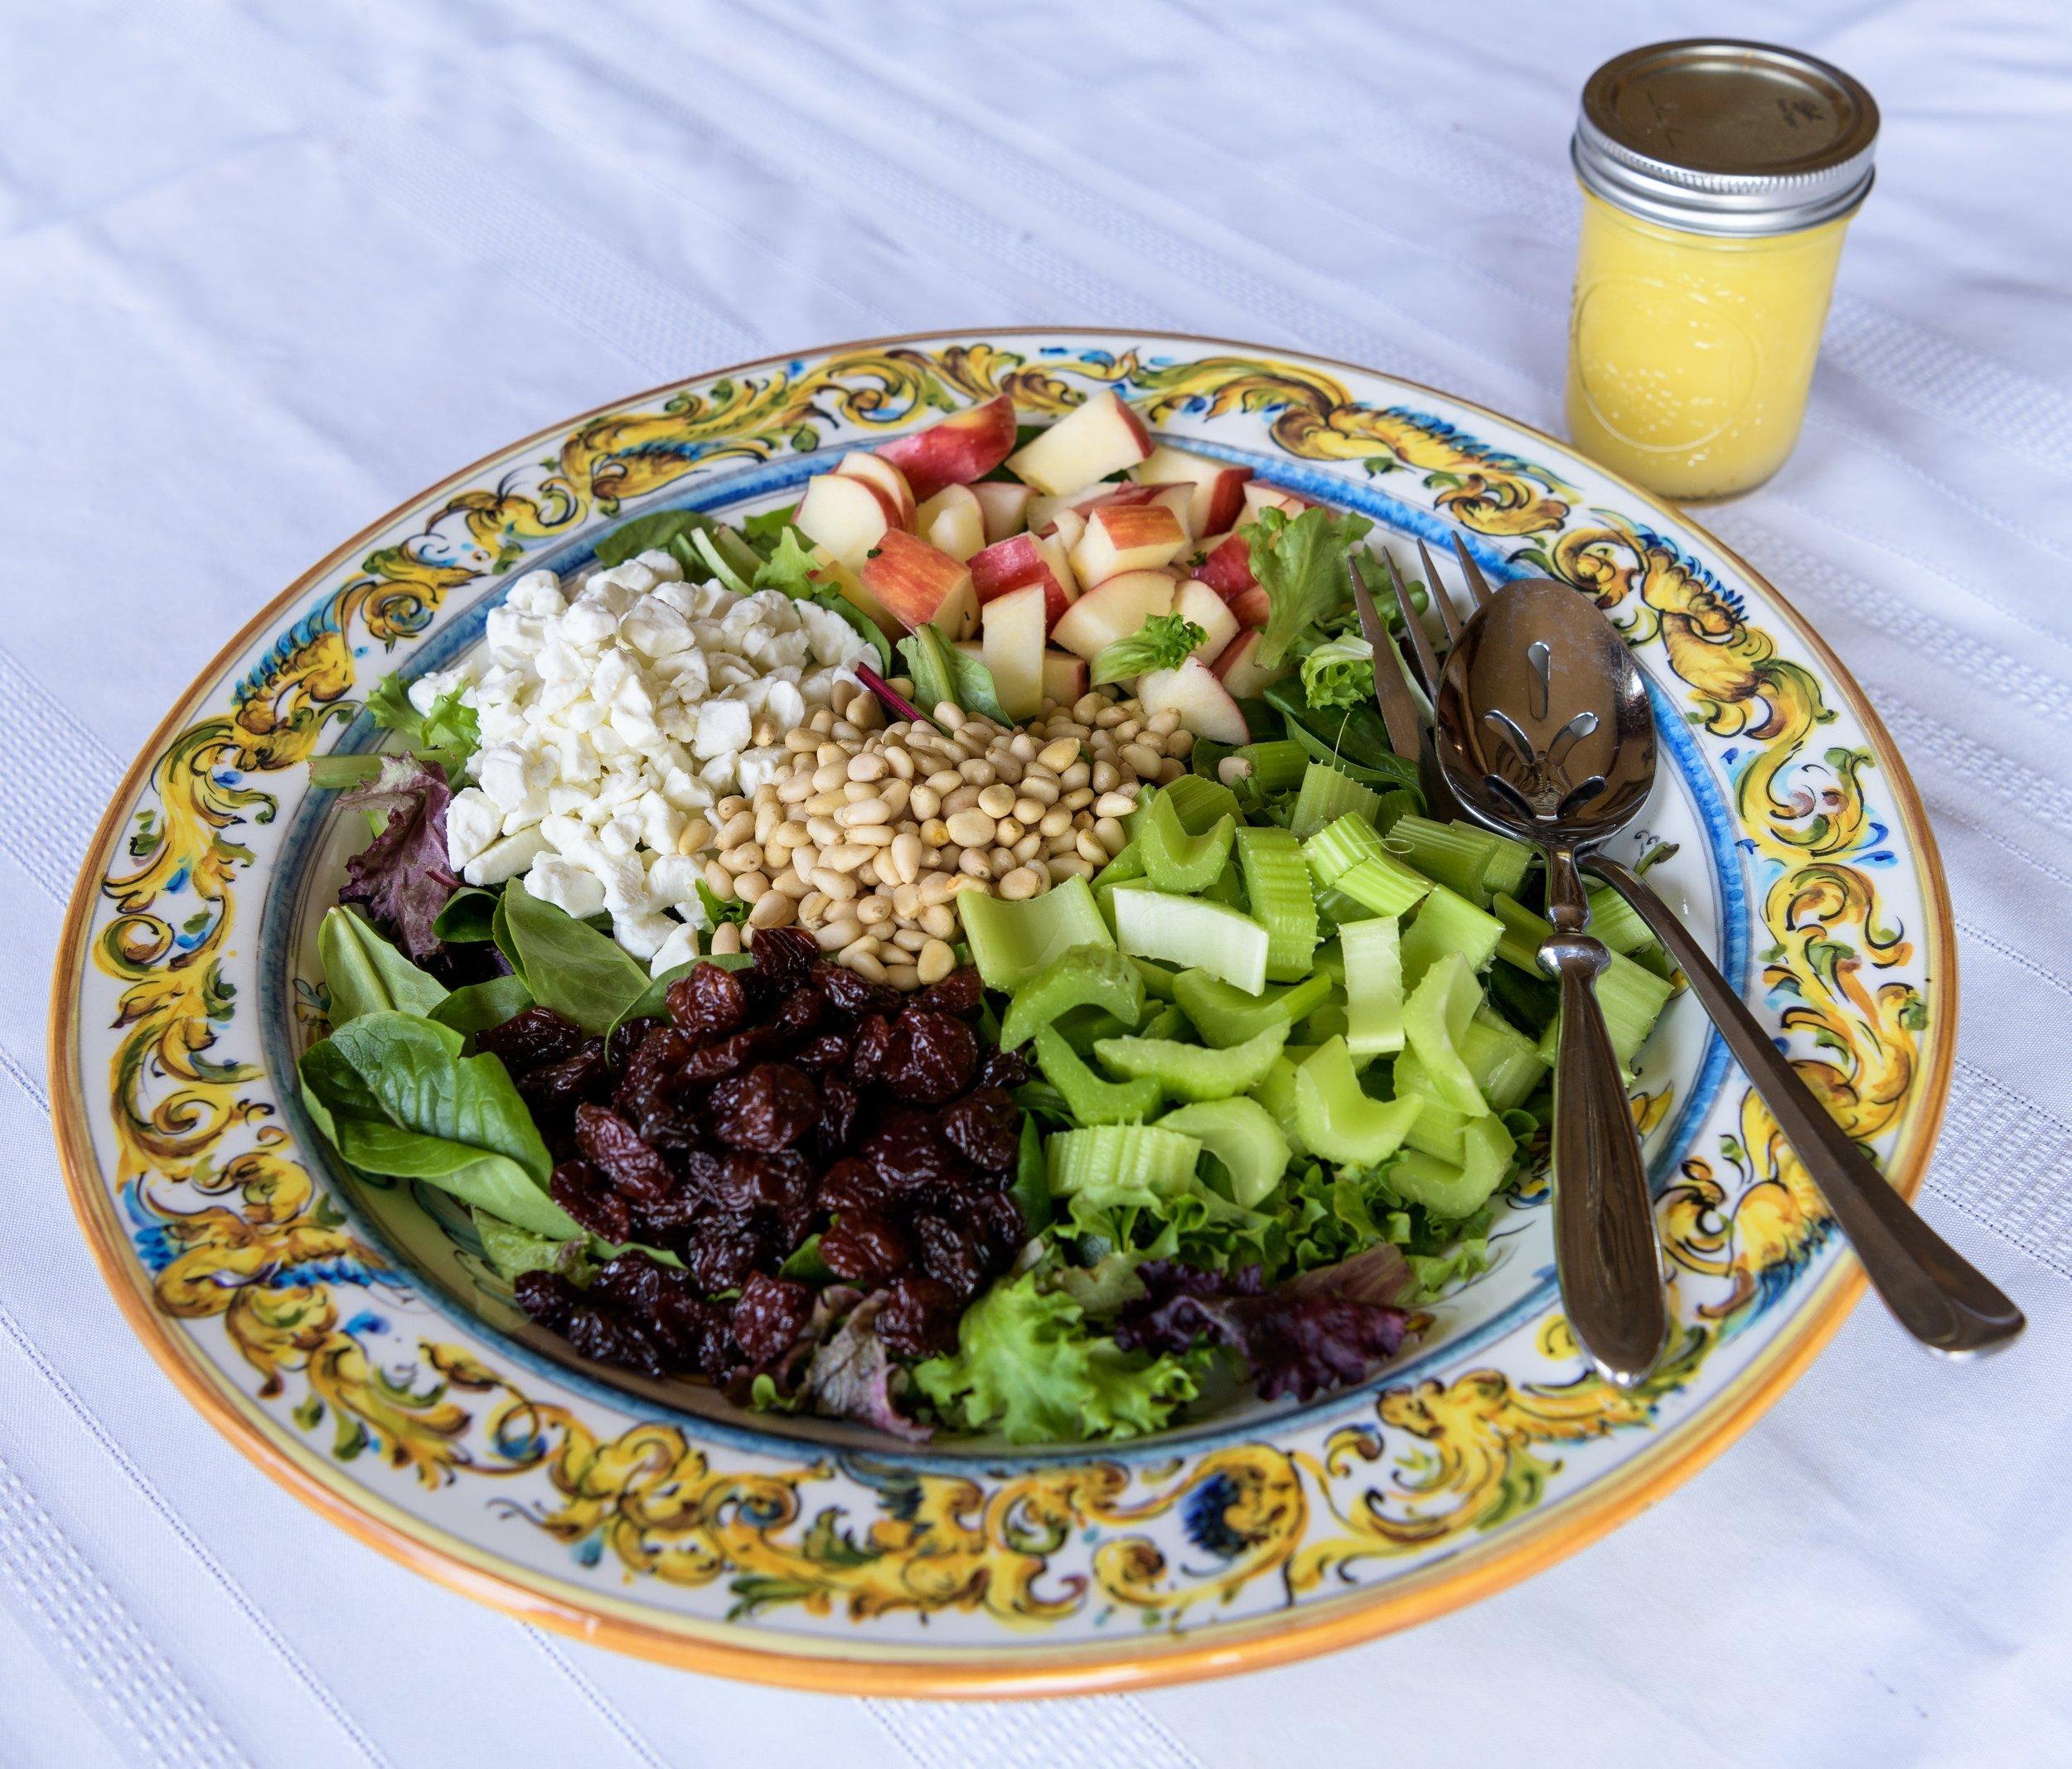 cherry-apple-greens-salad-with-dressing.jpg